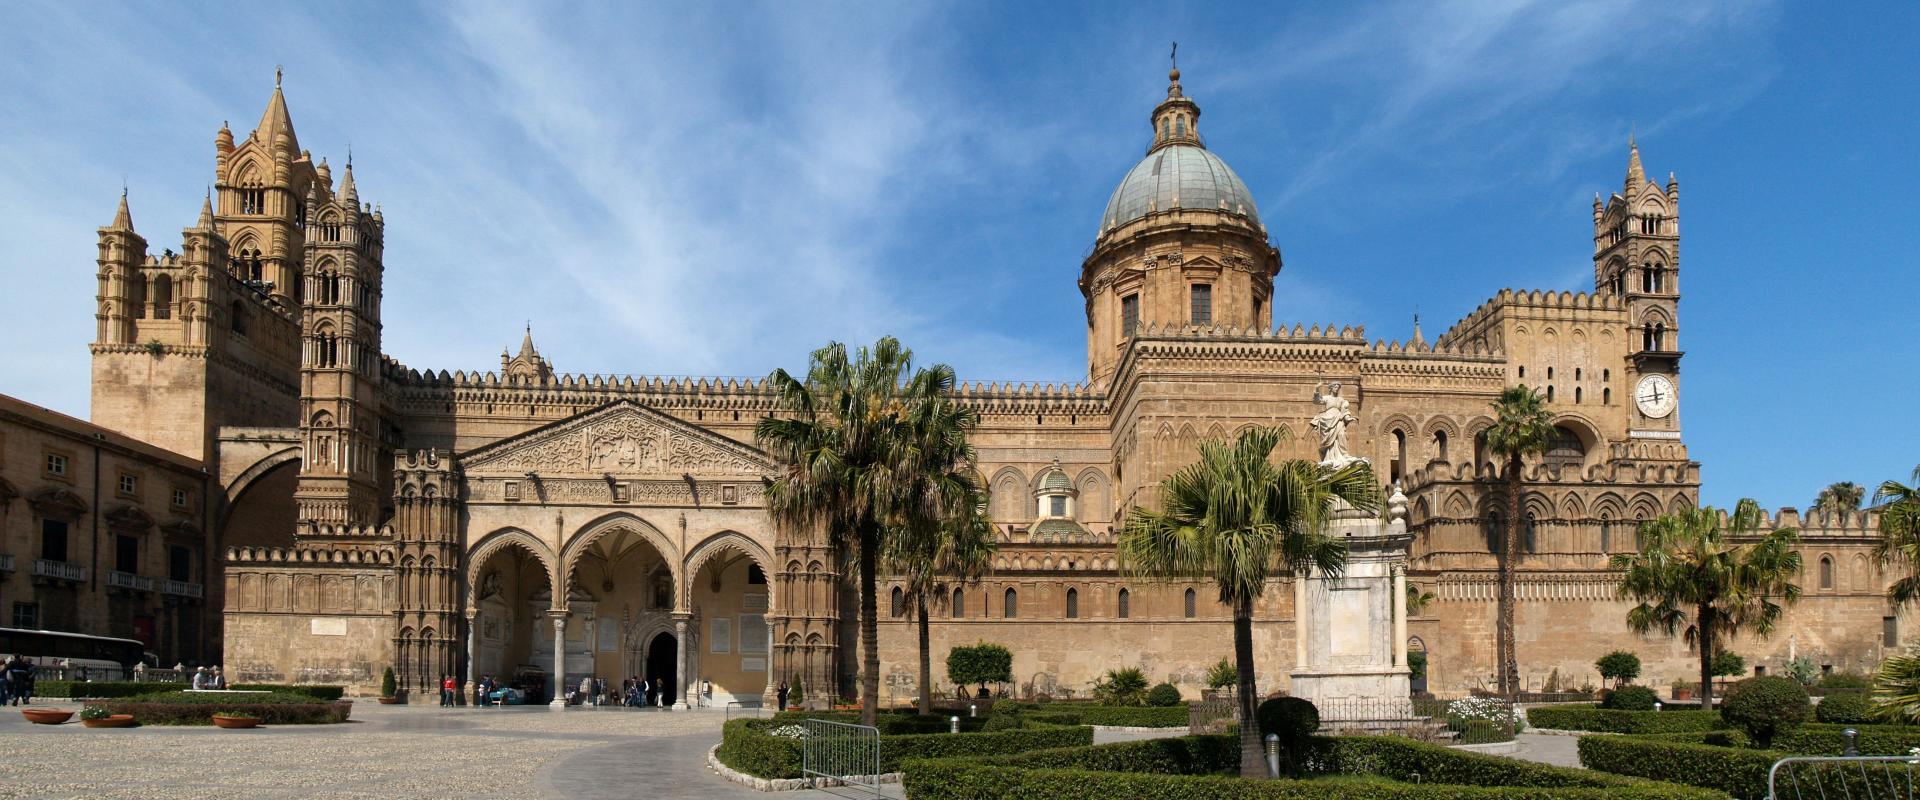 Visit of Palermo